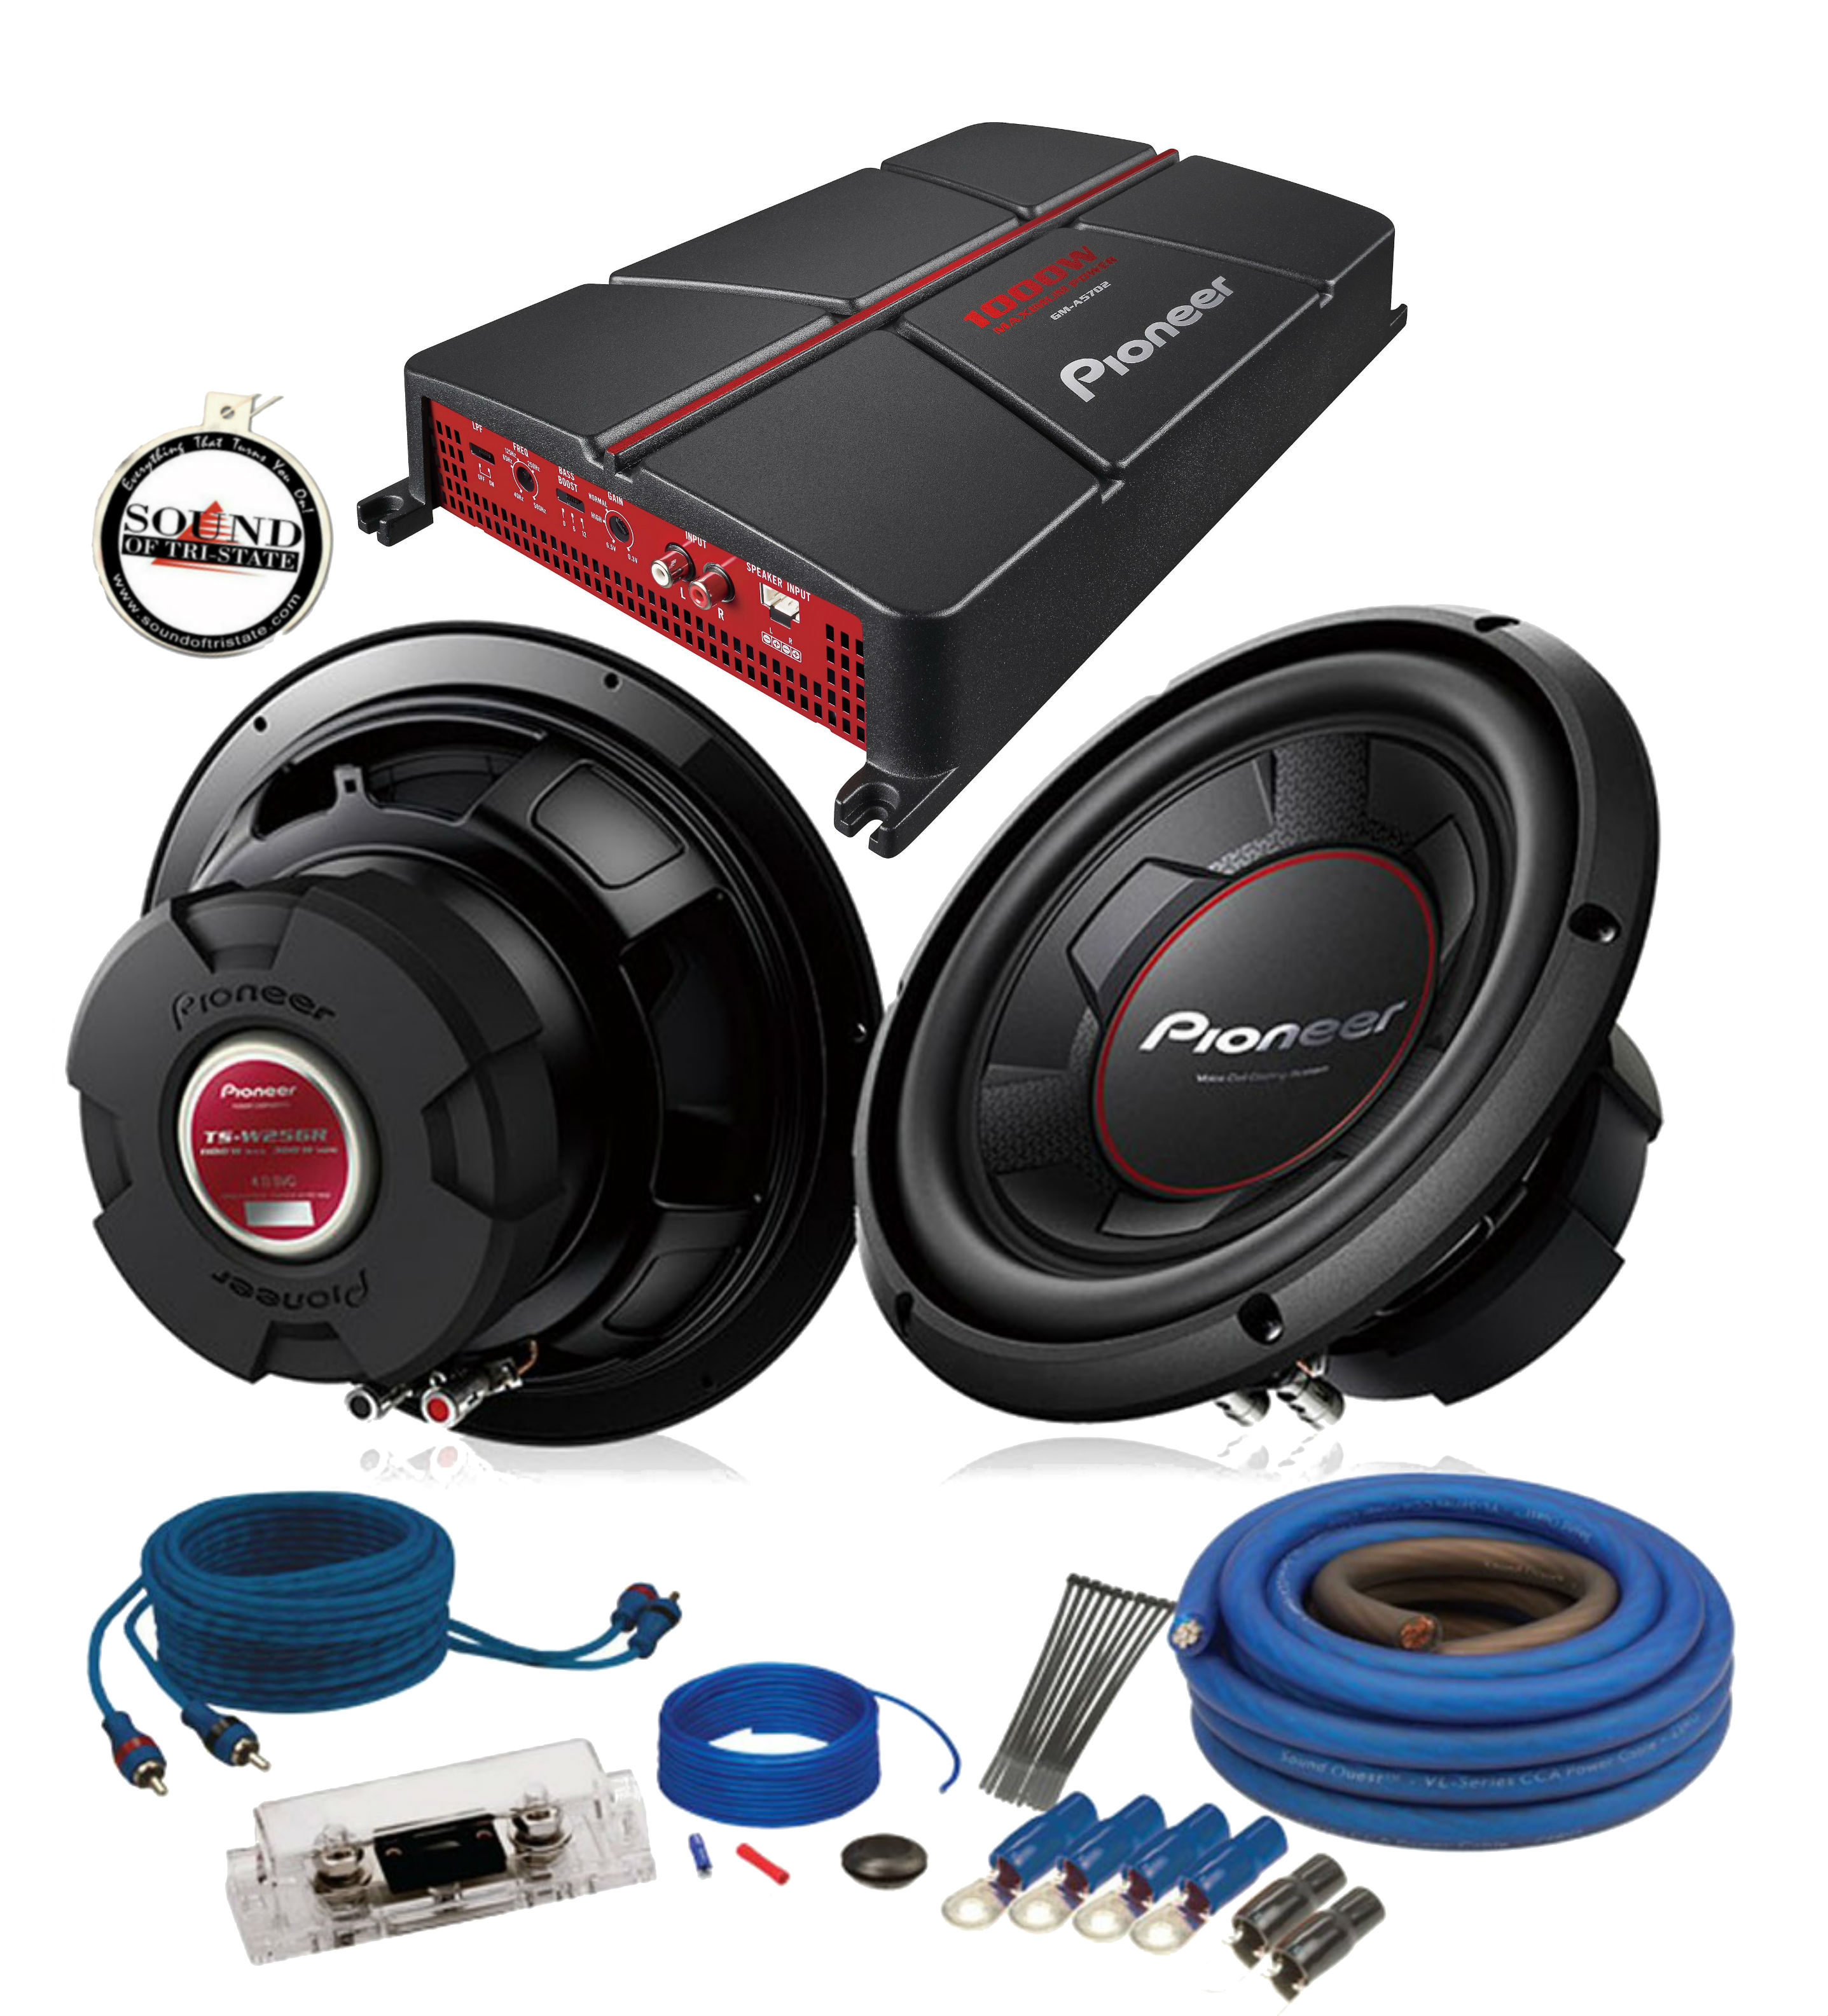 hight resolution of pioneer gm a5702 w two ts w256r amp wiring kit walmart com car audio wiring kit walmart